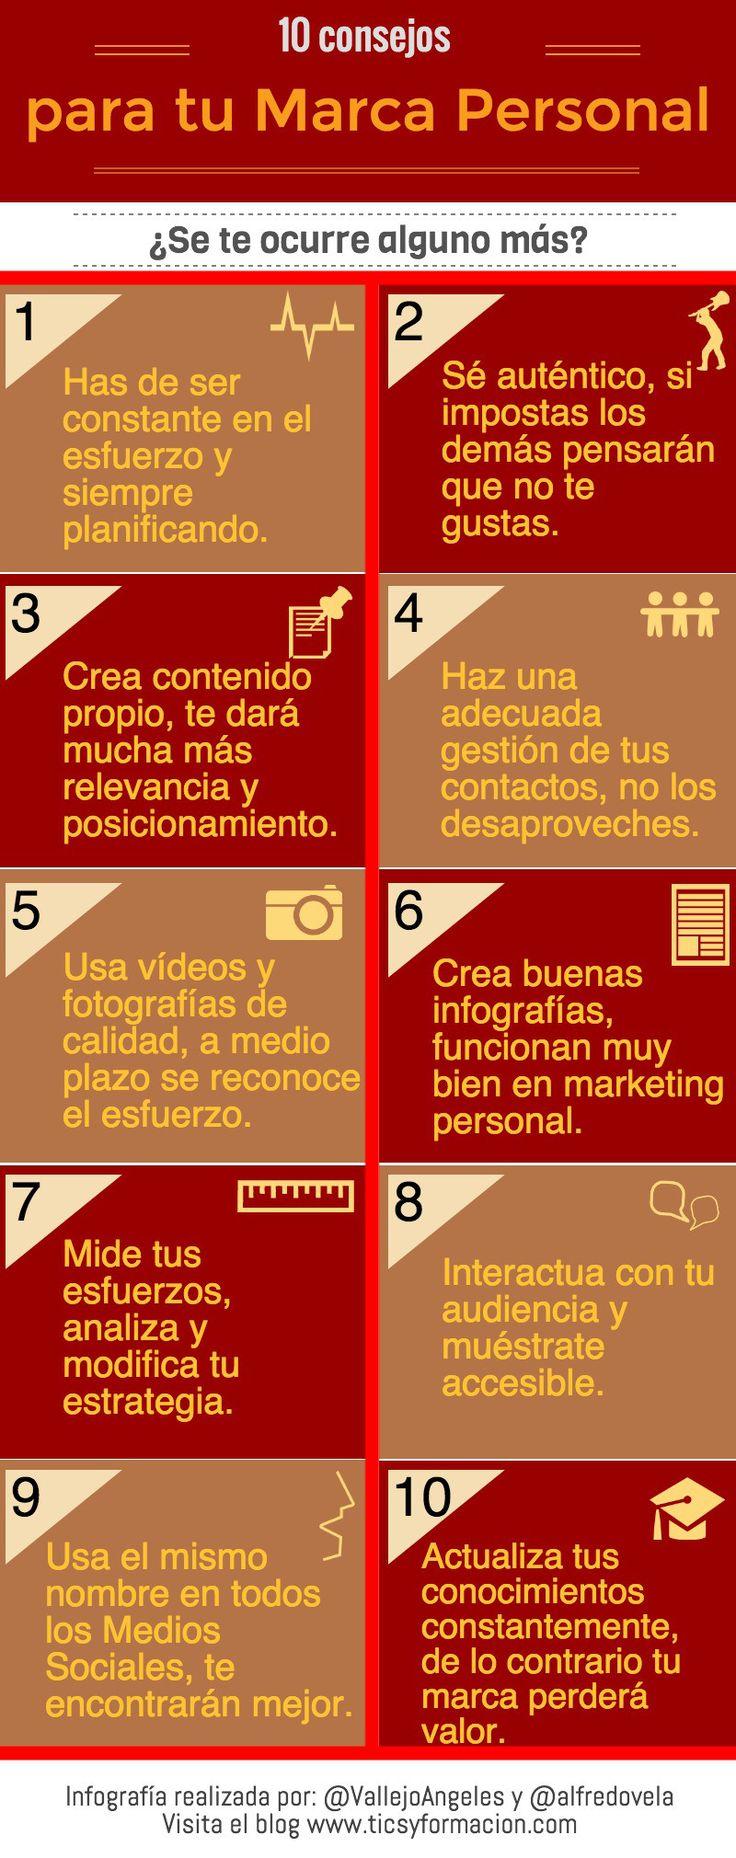 10 consejos para tu Marca Personal #infografia #infographic #marketing